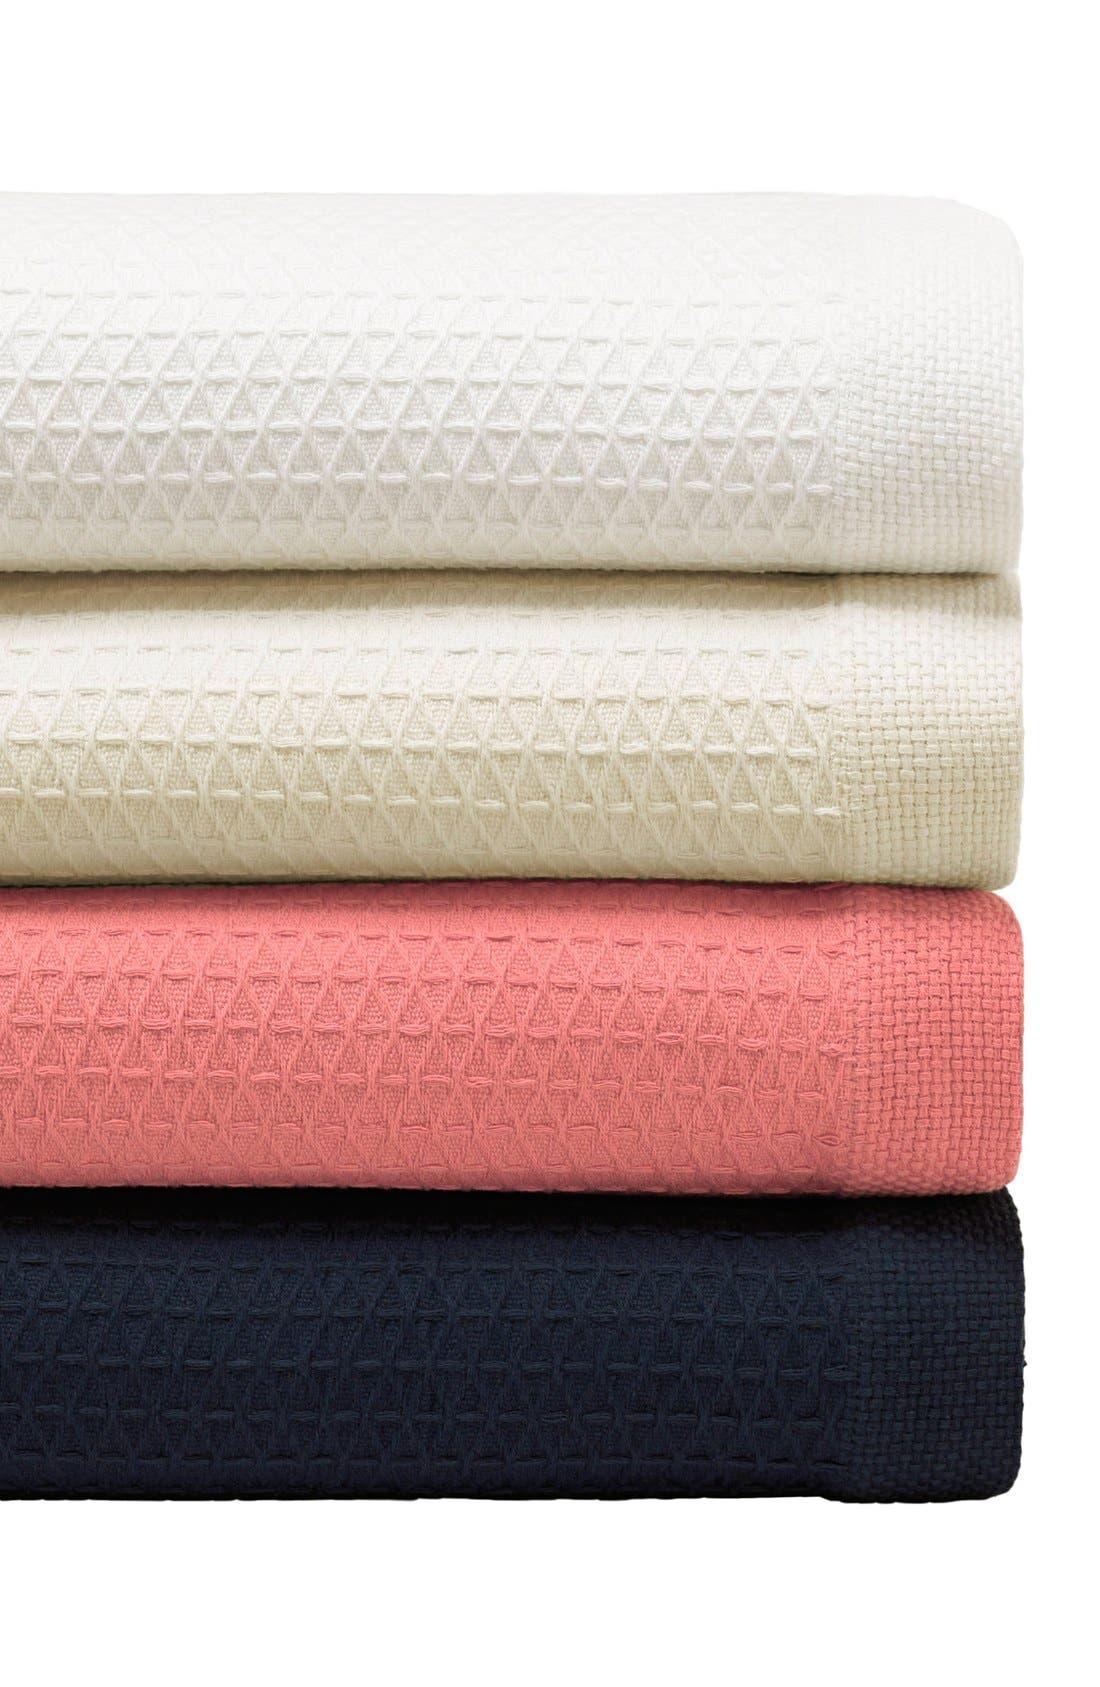 'Baird' Cotton Blanket,                             Alternate thumbnail 2, color,